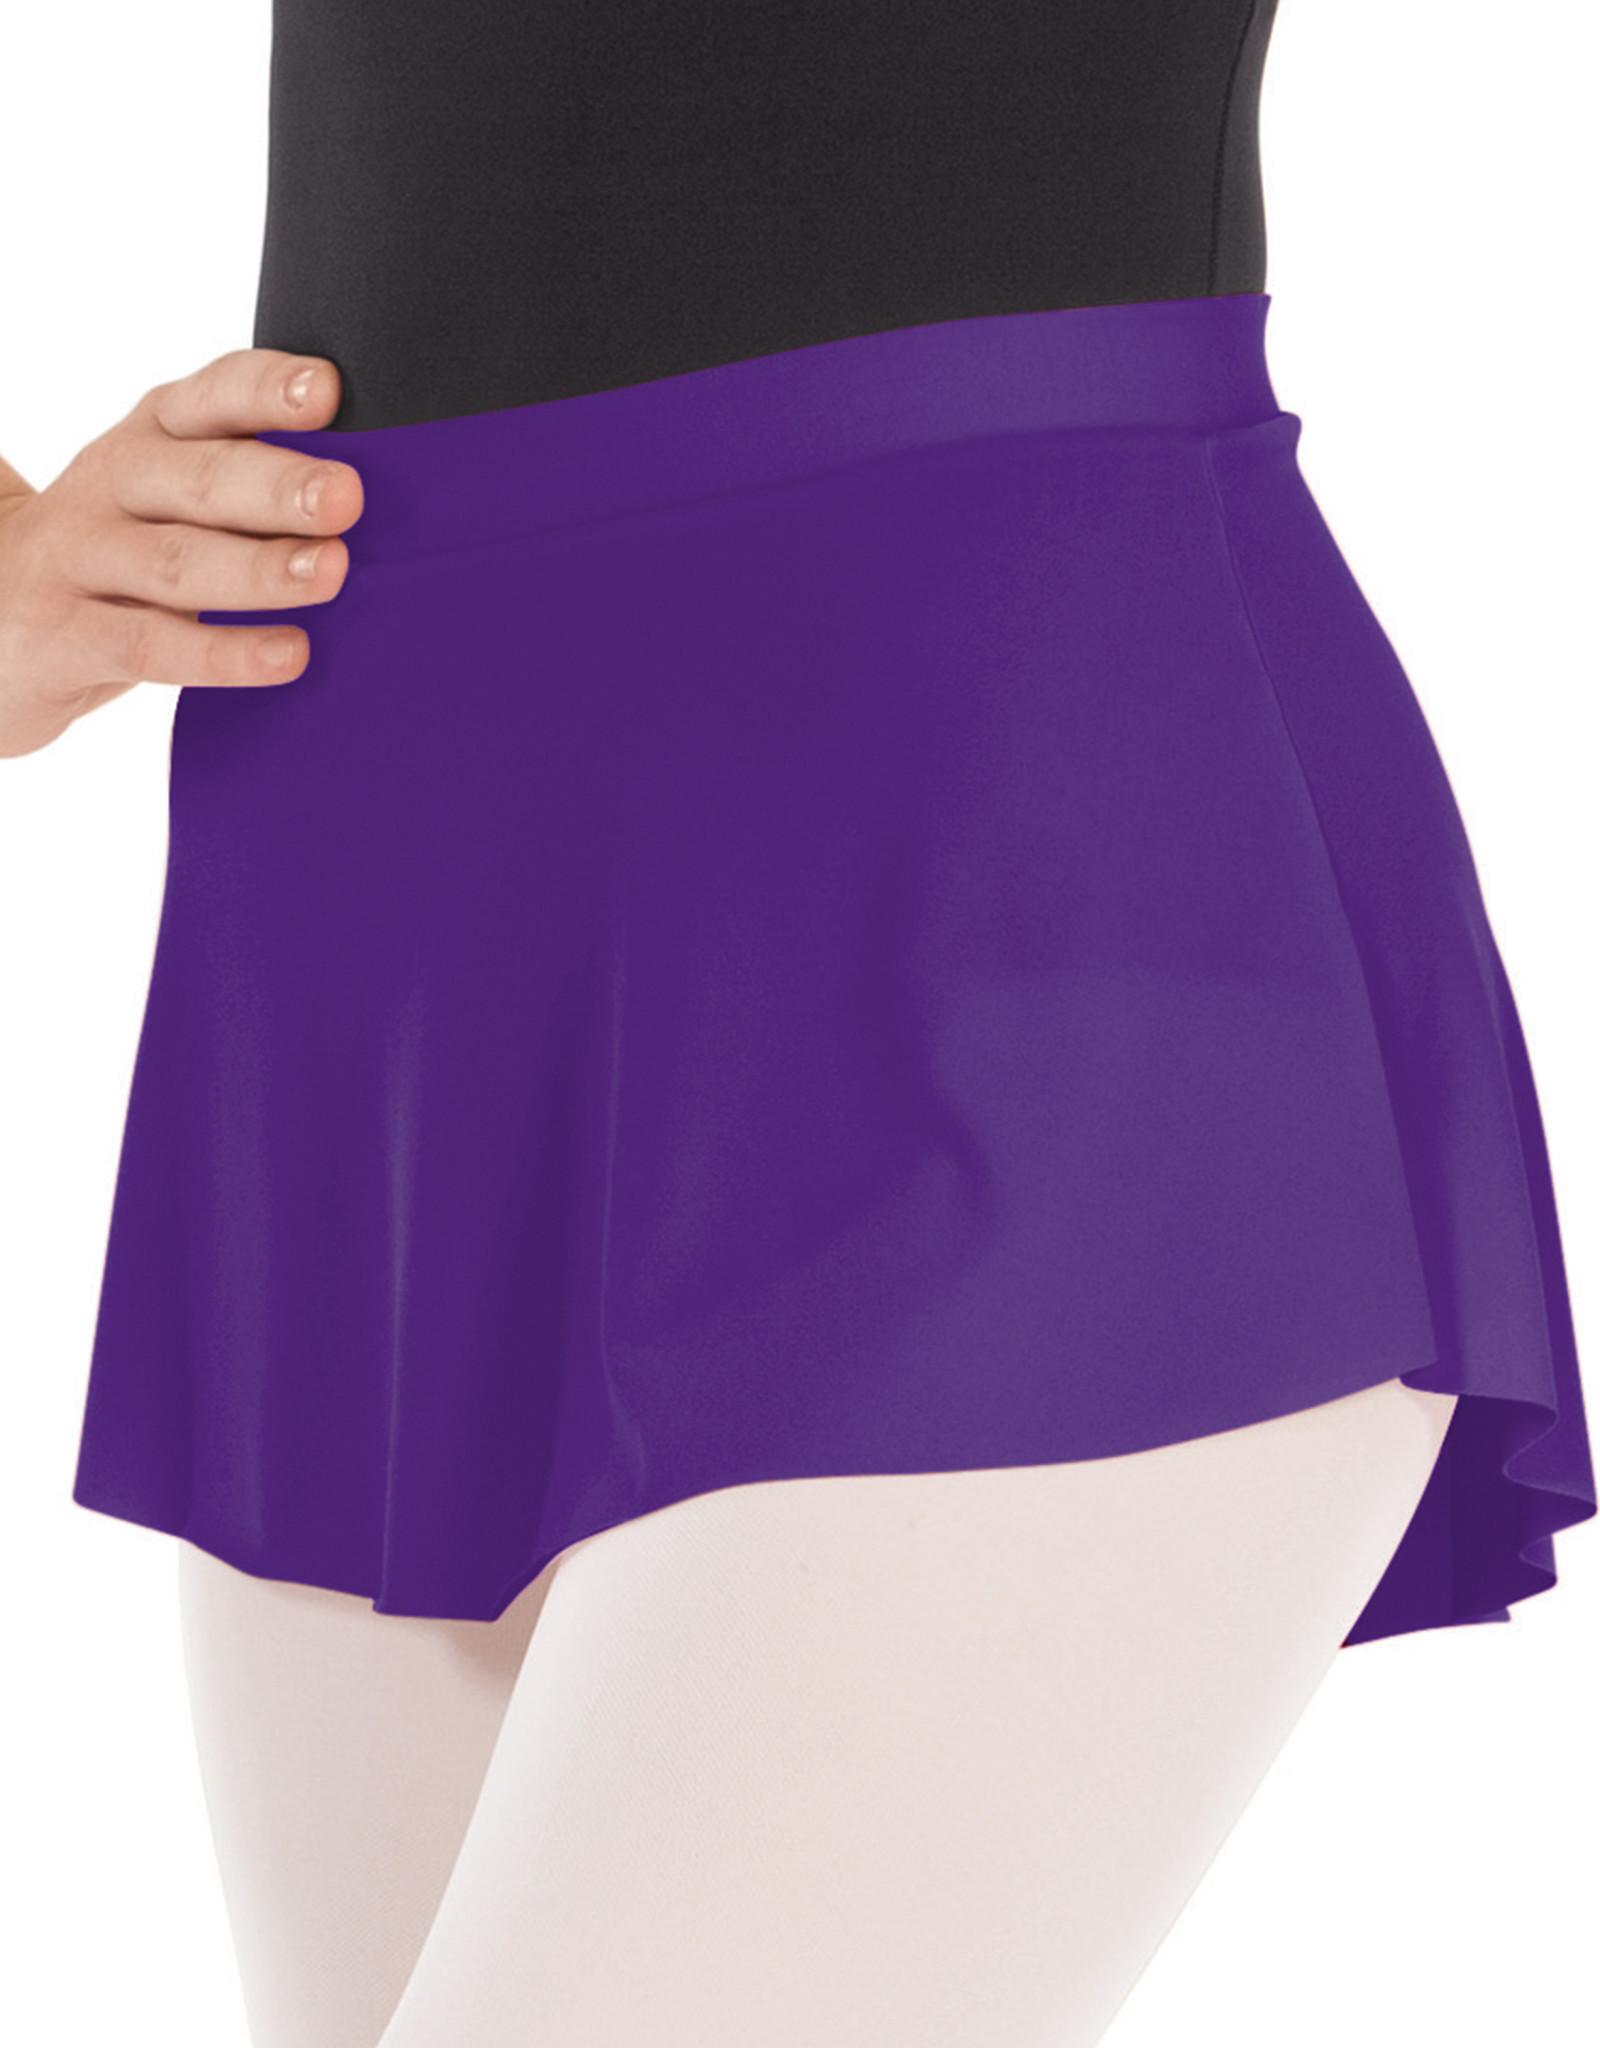 Eurotard Eurotard Adult Pull-on Mini Ballet Skirt 6121